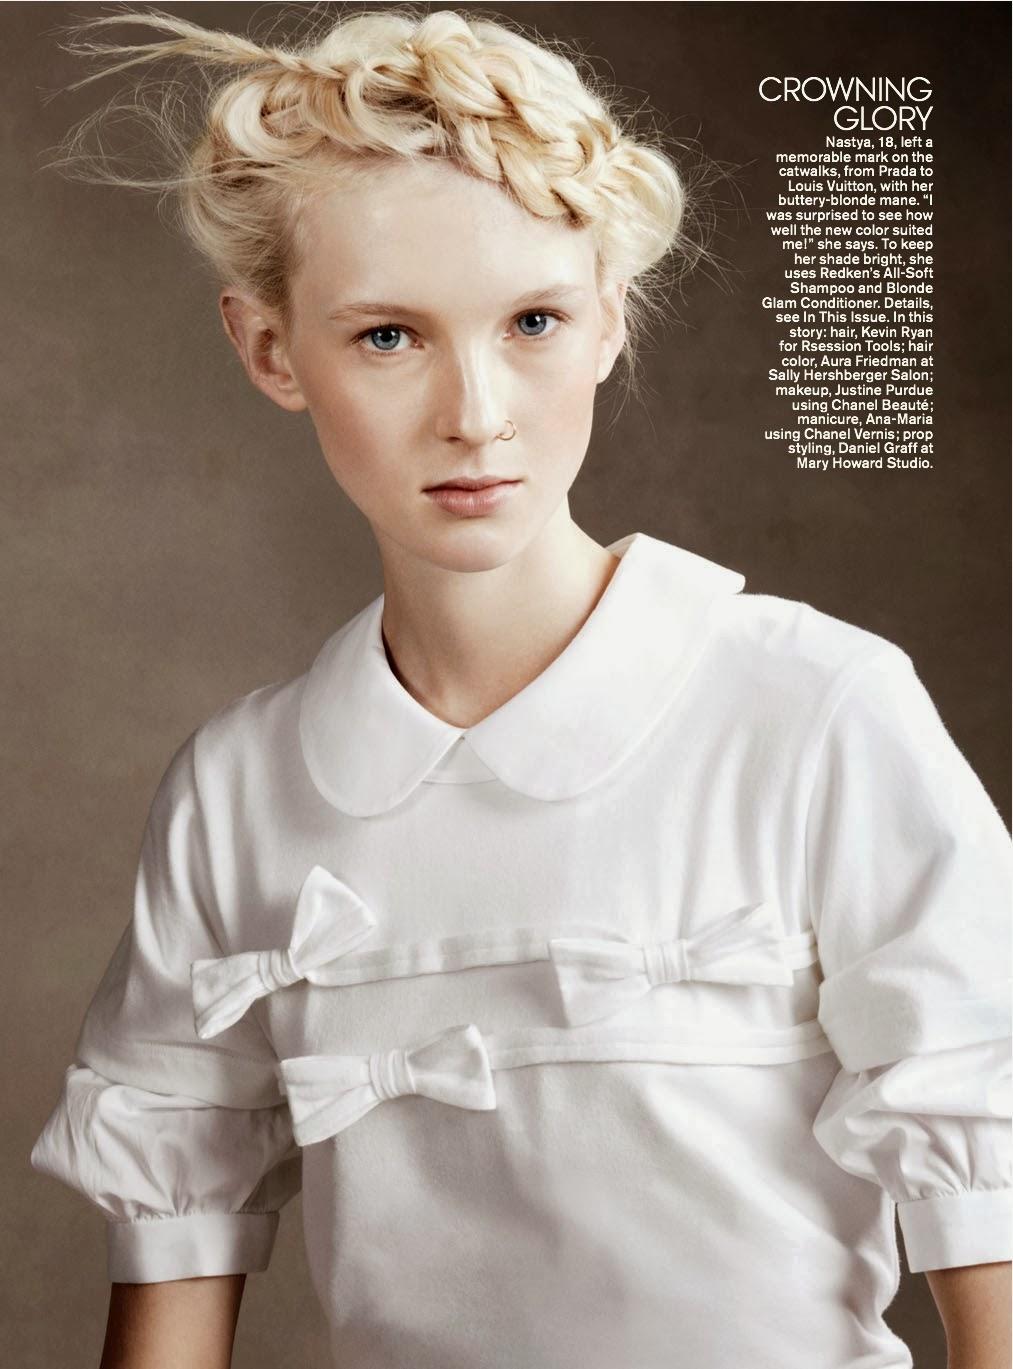 Magazine Photoshoot : Charlotte Carey, Victoria Brito, Solomiya Zgoda, Nastya Sten And Vickie Sorensen Photoshoot